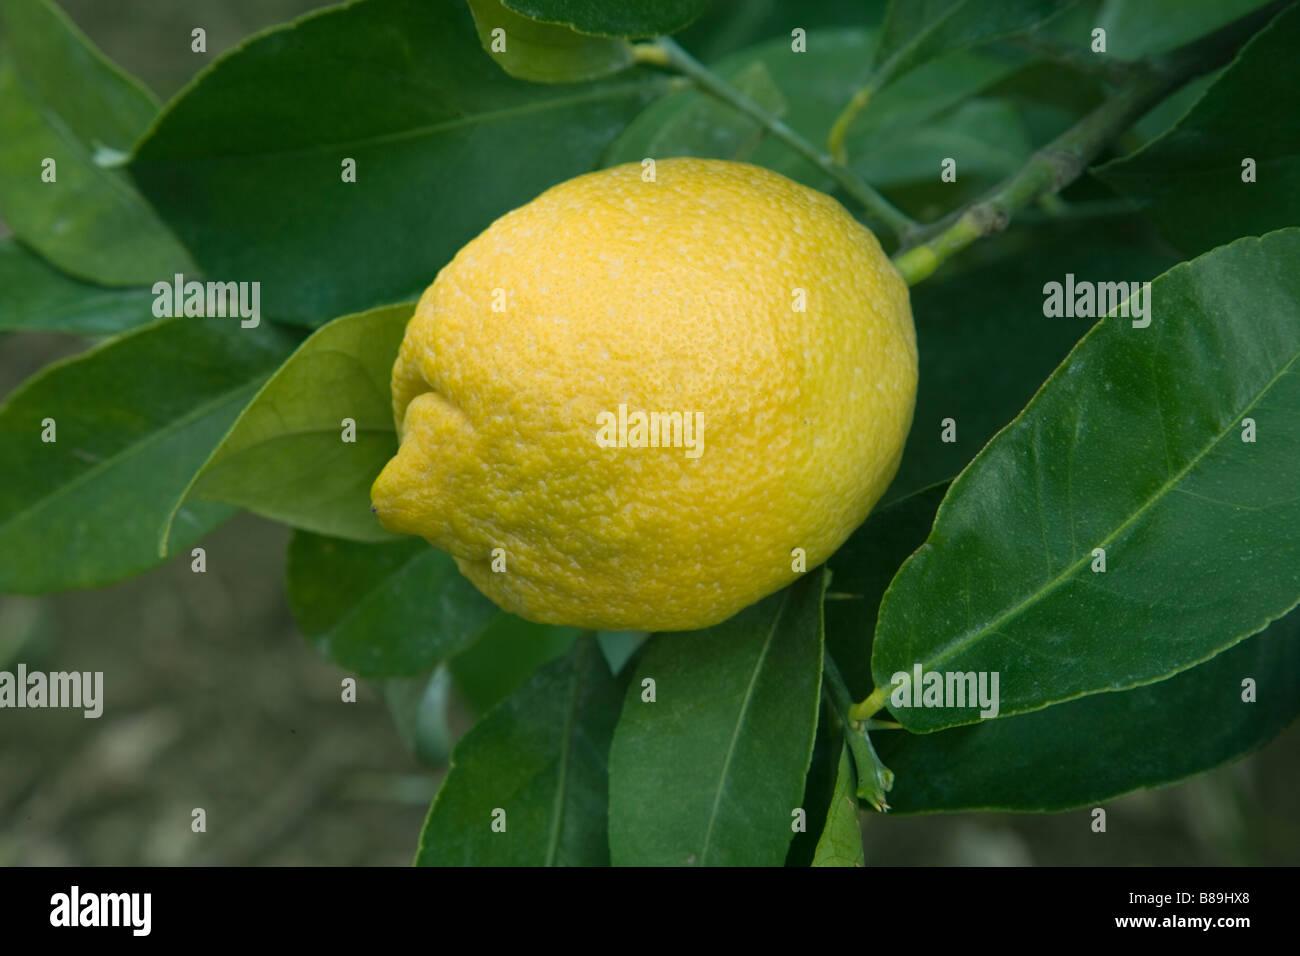 Mature Lemon 'Lisbon' variety hanging on branch. - Stock Image